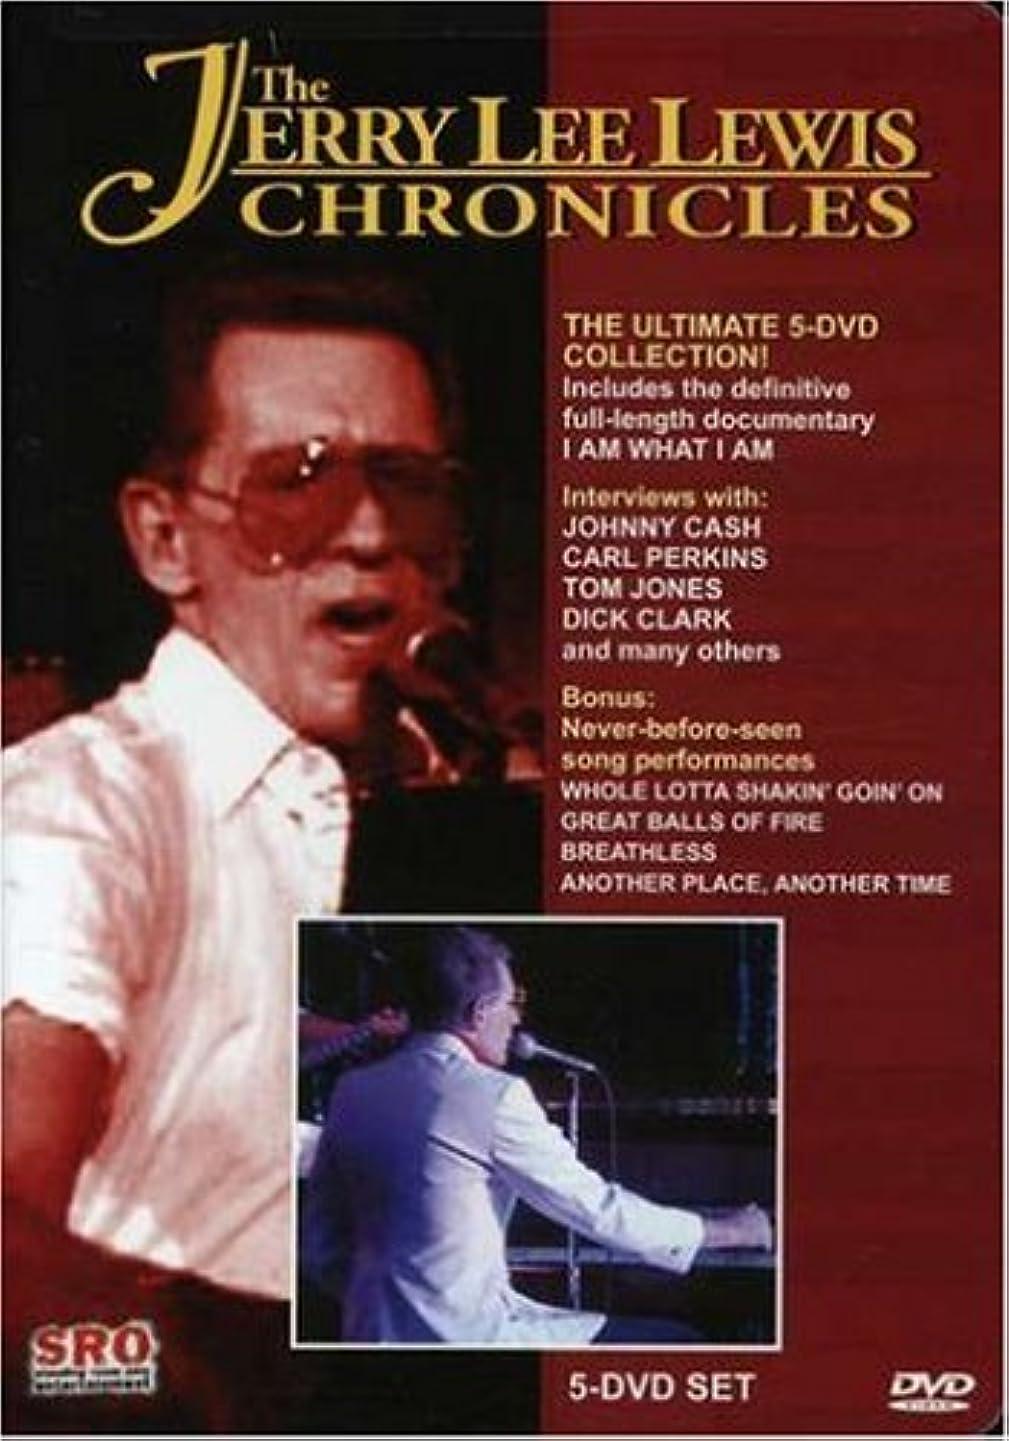 Jerry Lee Lewis Chronicles / Sam Phillips, Johnny Cash, Dick Clark